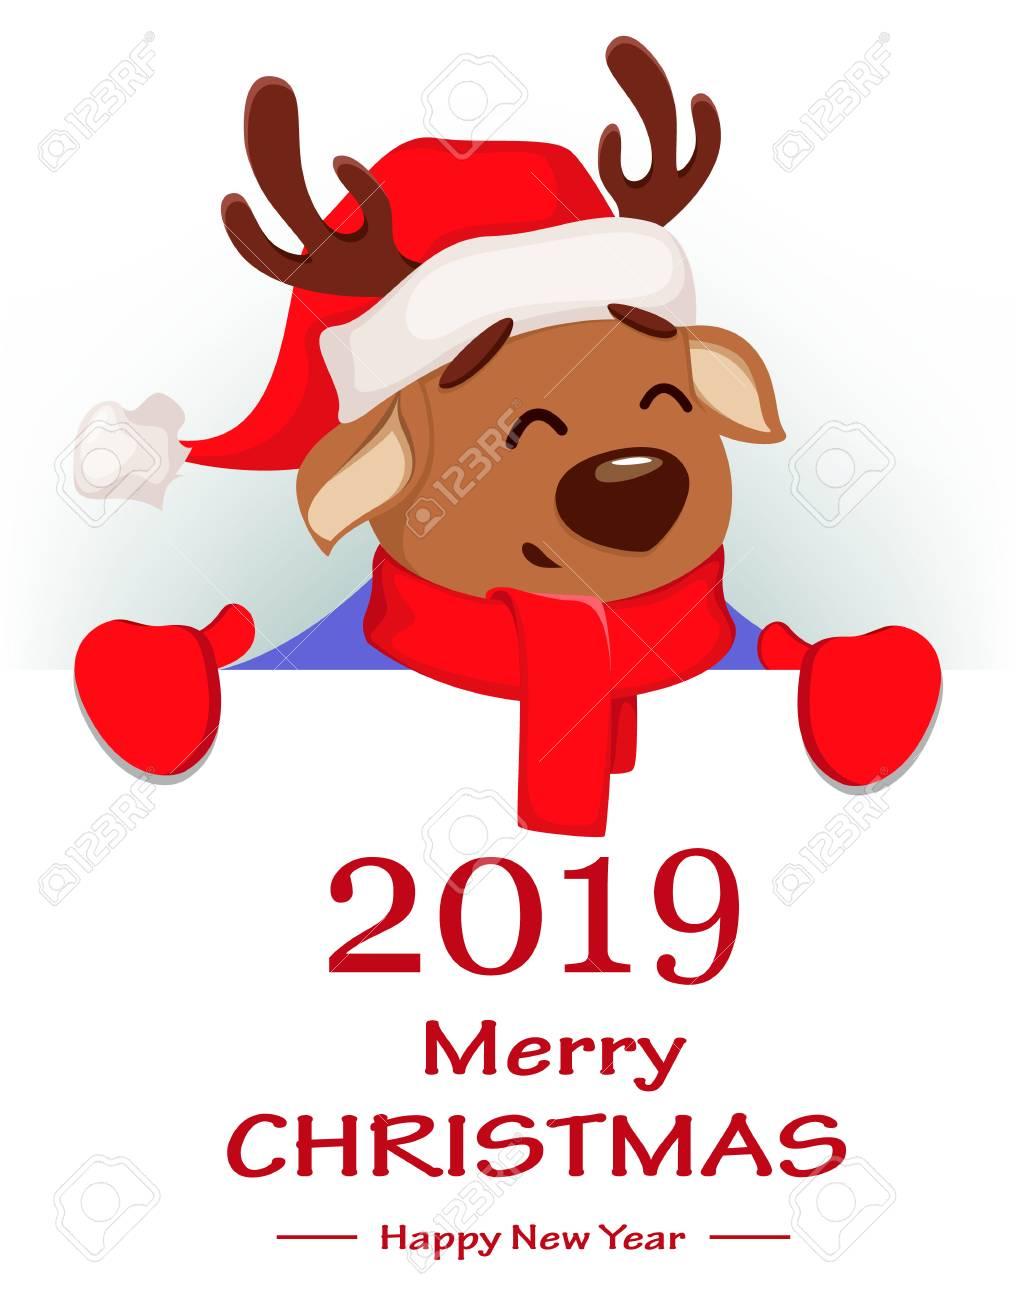 968d6093c37da Merry Christmas. Cute deer wearing Santa Claus hat and scarf. Cheerful funny  cartoon character